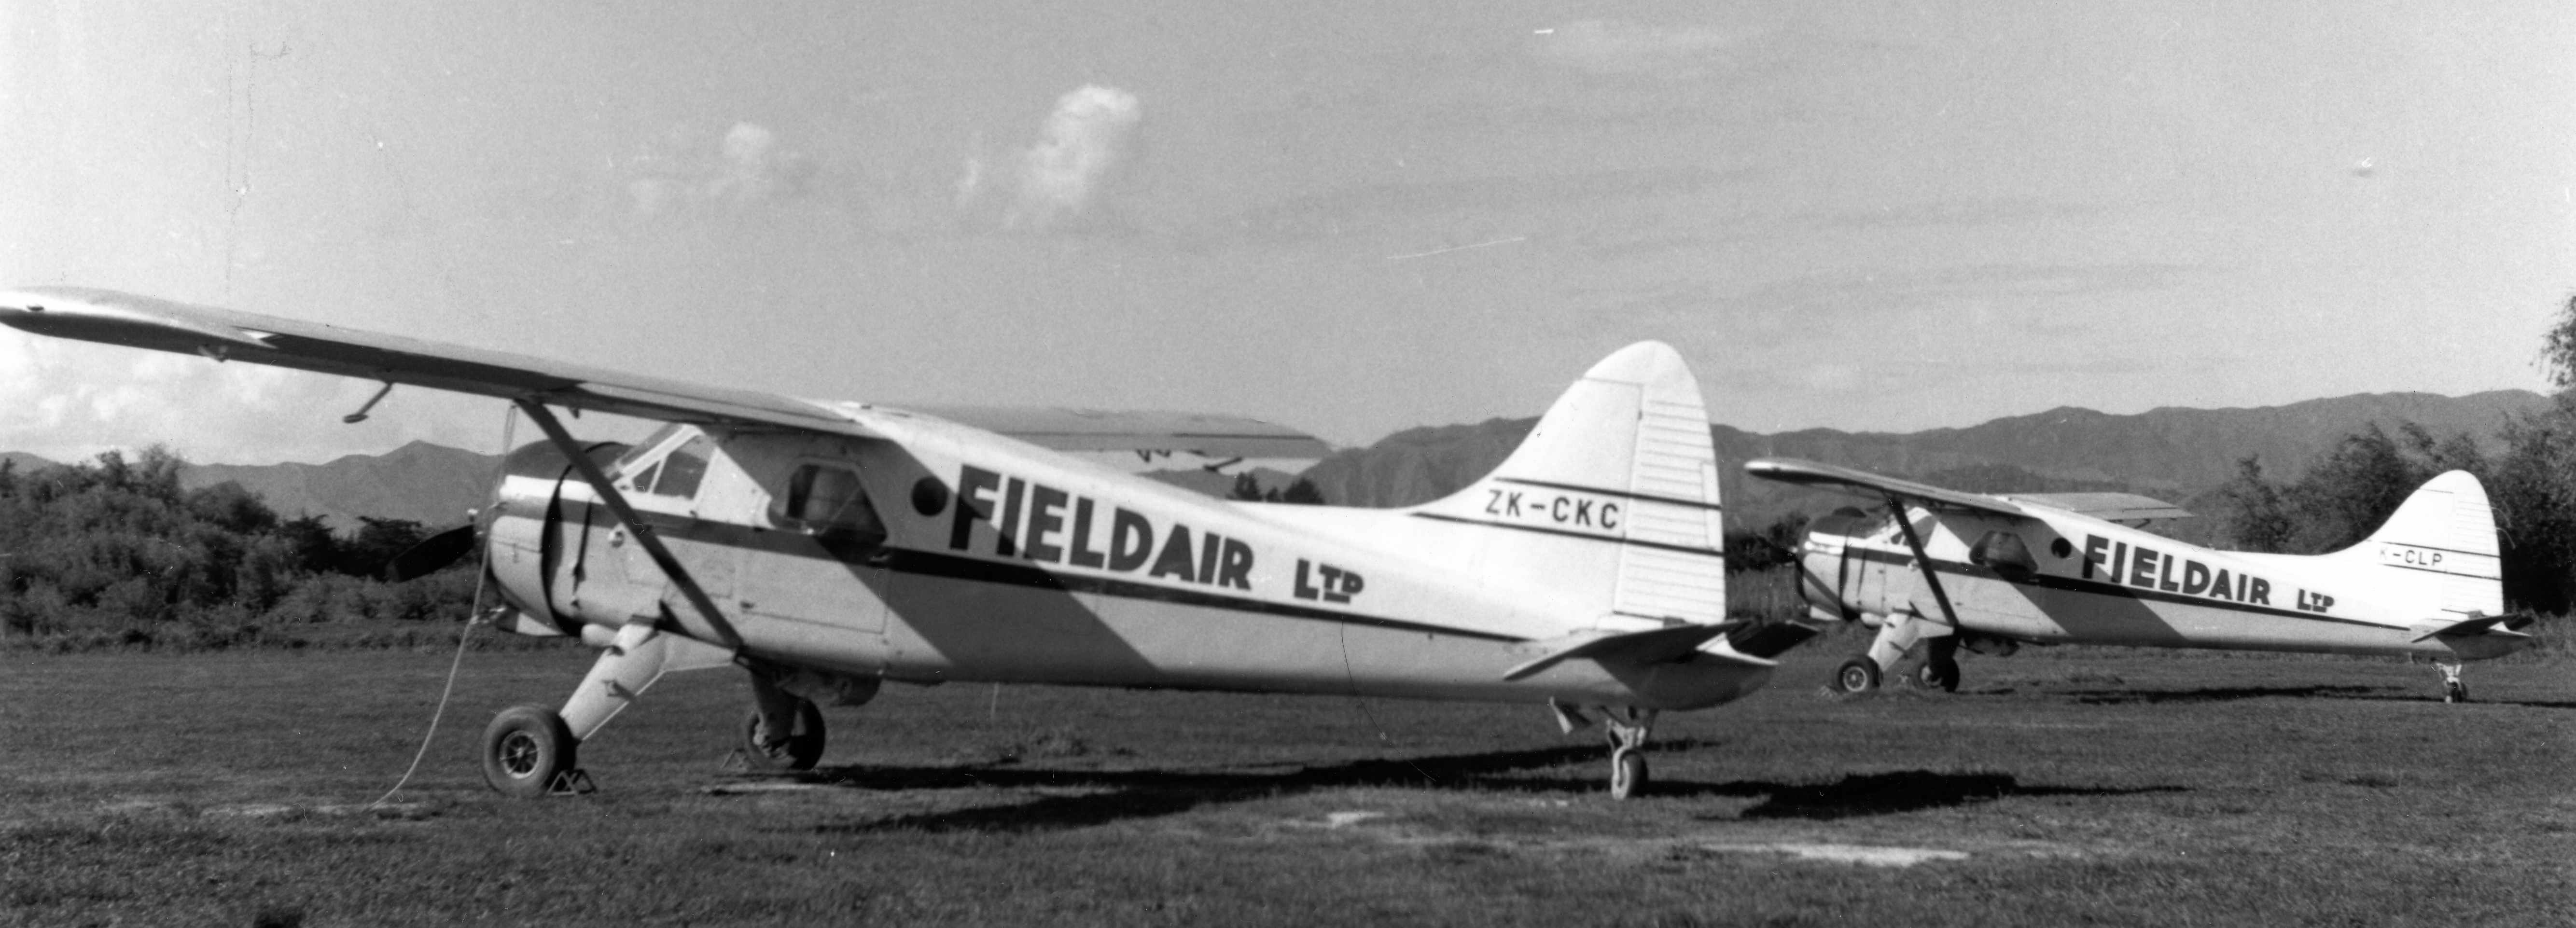 BLOG 20 HALFORD DHC Files 2-2019 Field Air NZ top dressing Beavers Phil Hanson photo